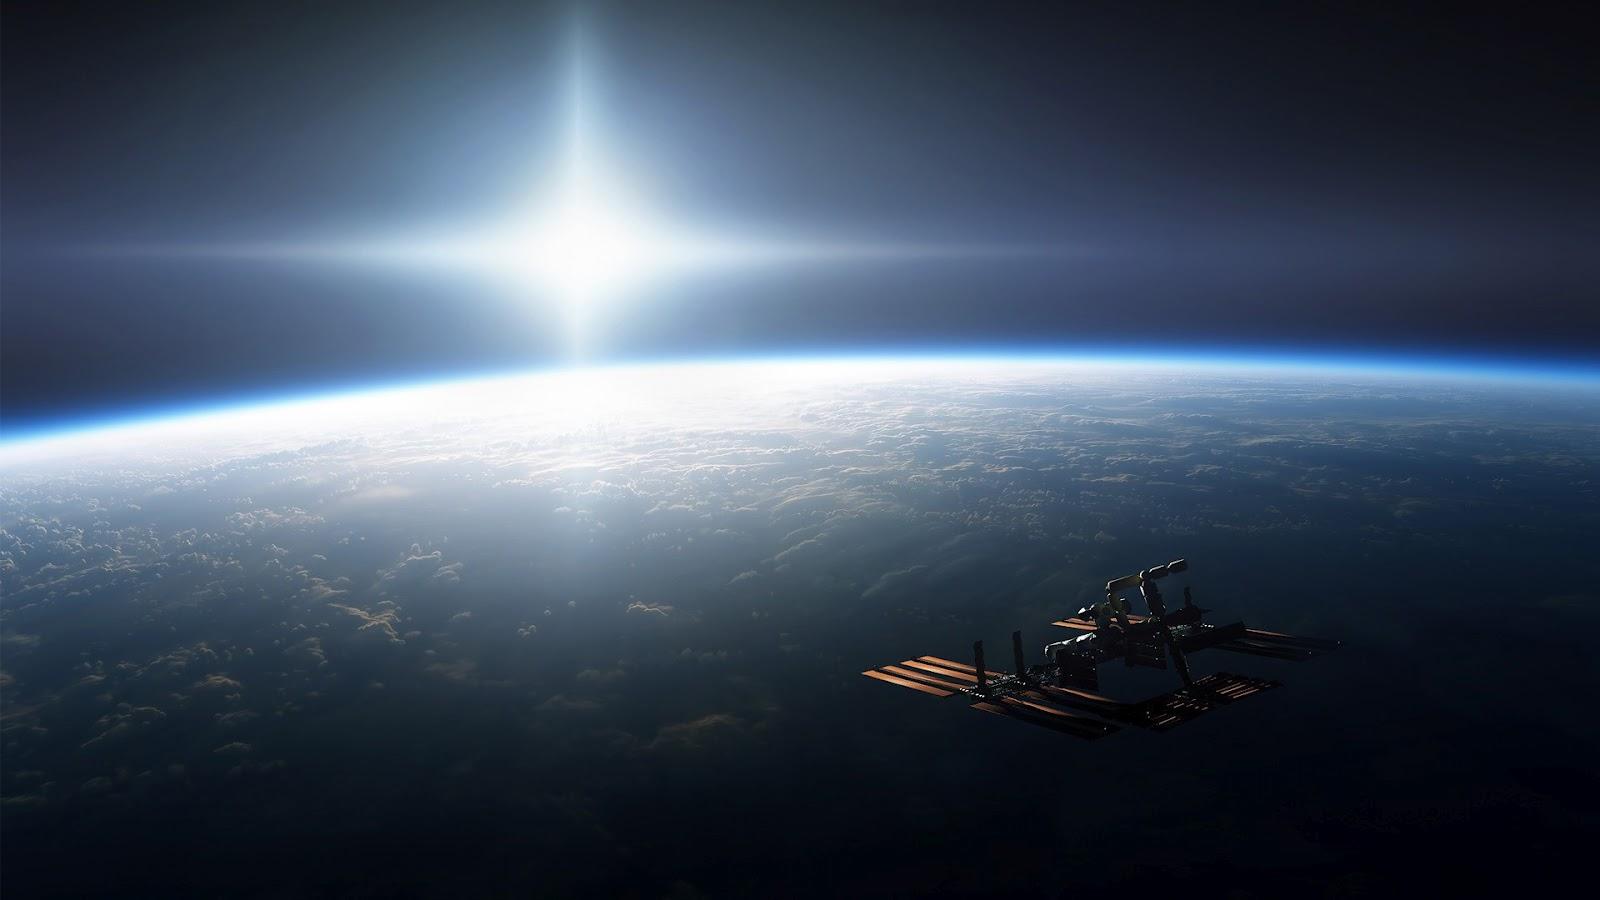 http://4.bp.blogspot.com/-YcYPNif_3yQ/UCY26TIviKI/AAAAAAAAMac/P1BYLvIJlGE/s1600/earth-space-station.jpg